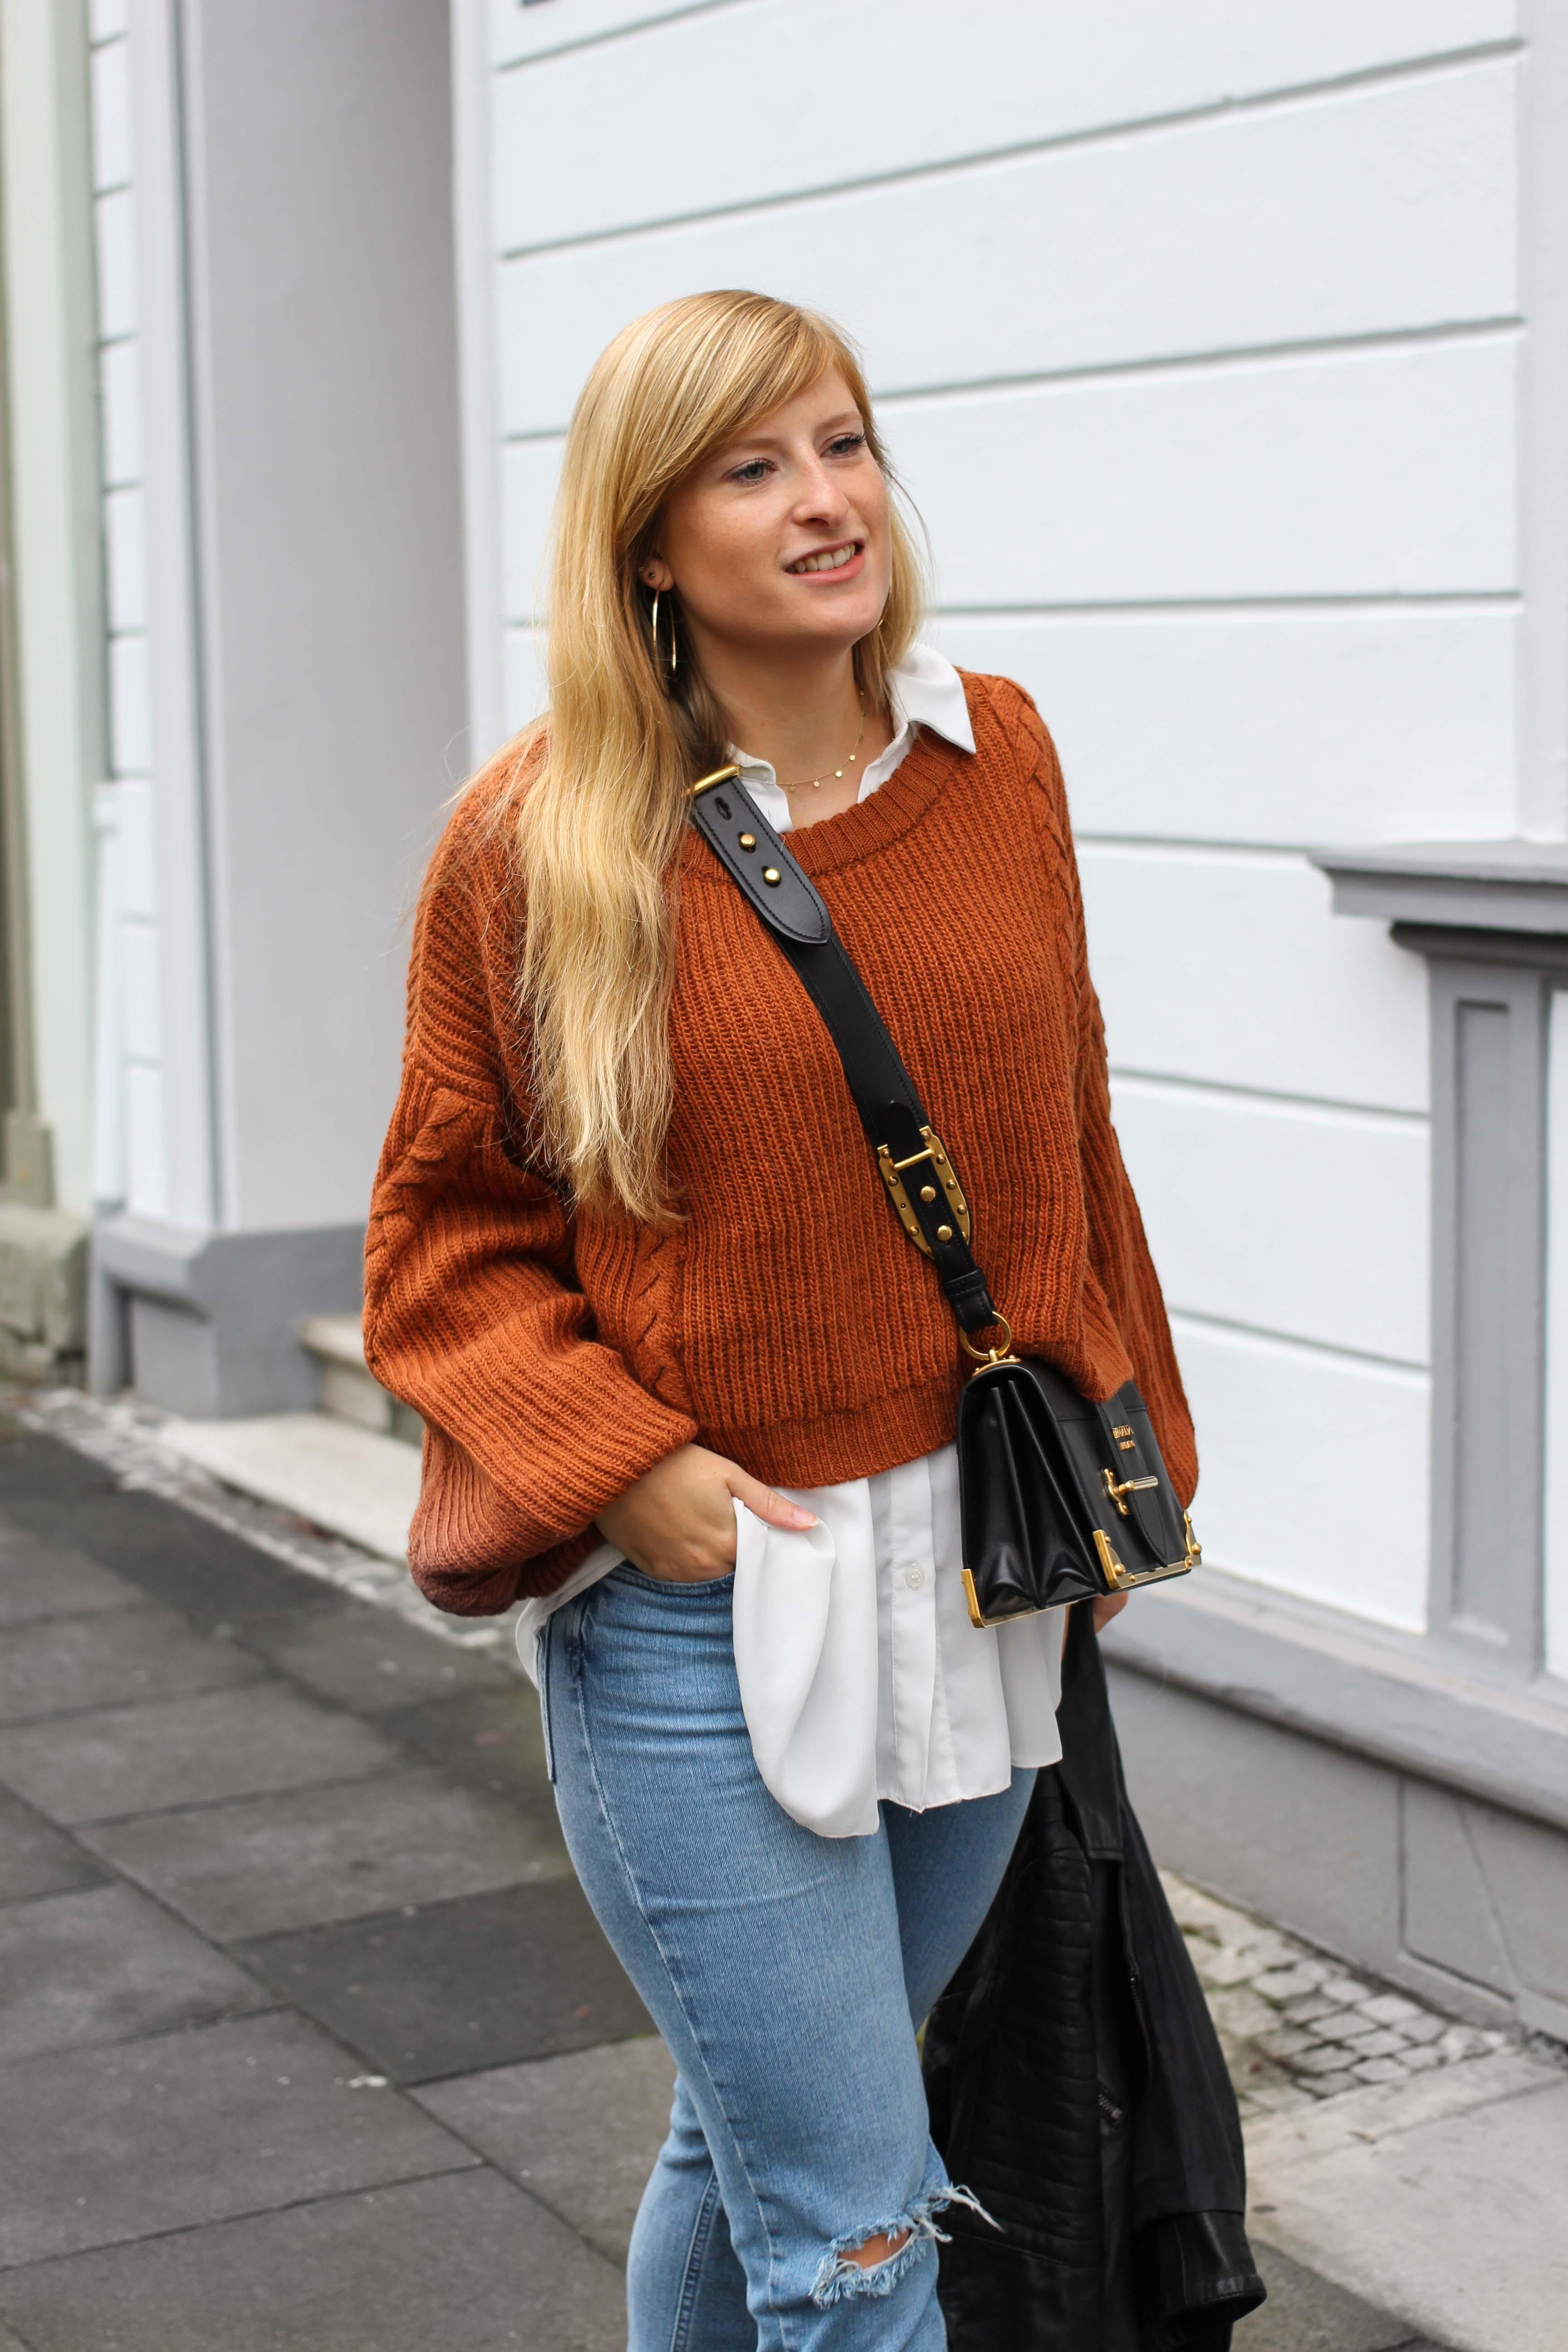 Übergangslook Crop Wollpullover Layering Bluse kombinieren zerrissene Jeans Modeblog Outfit Streetstyle Köln 8